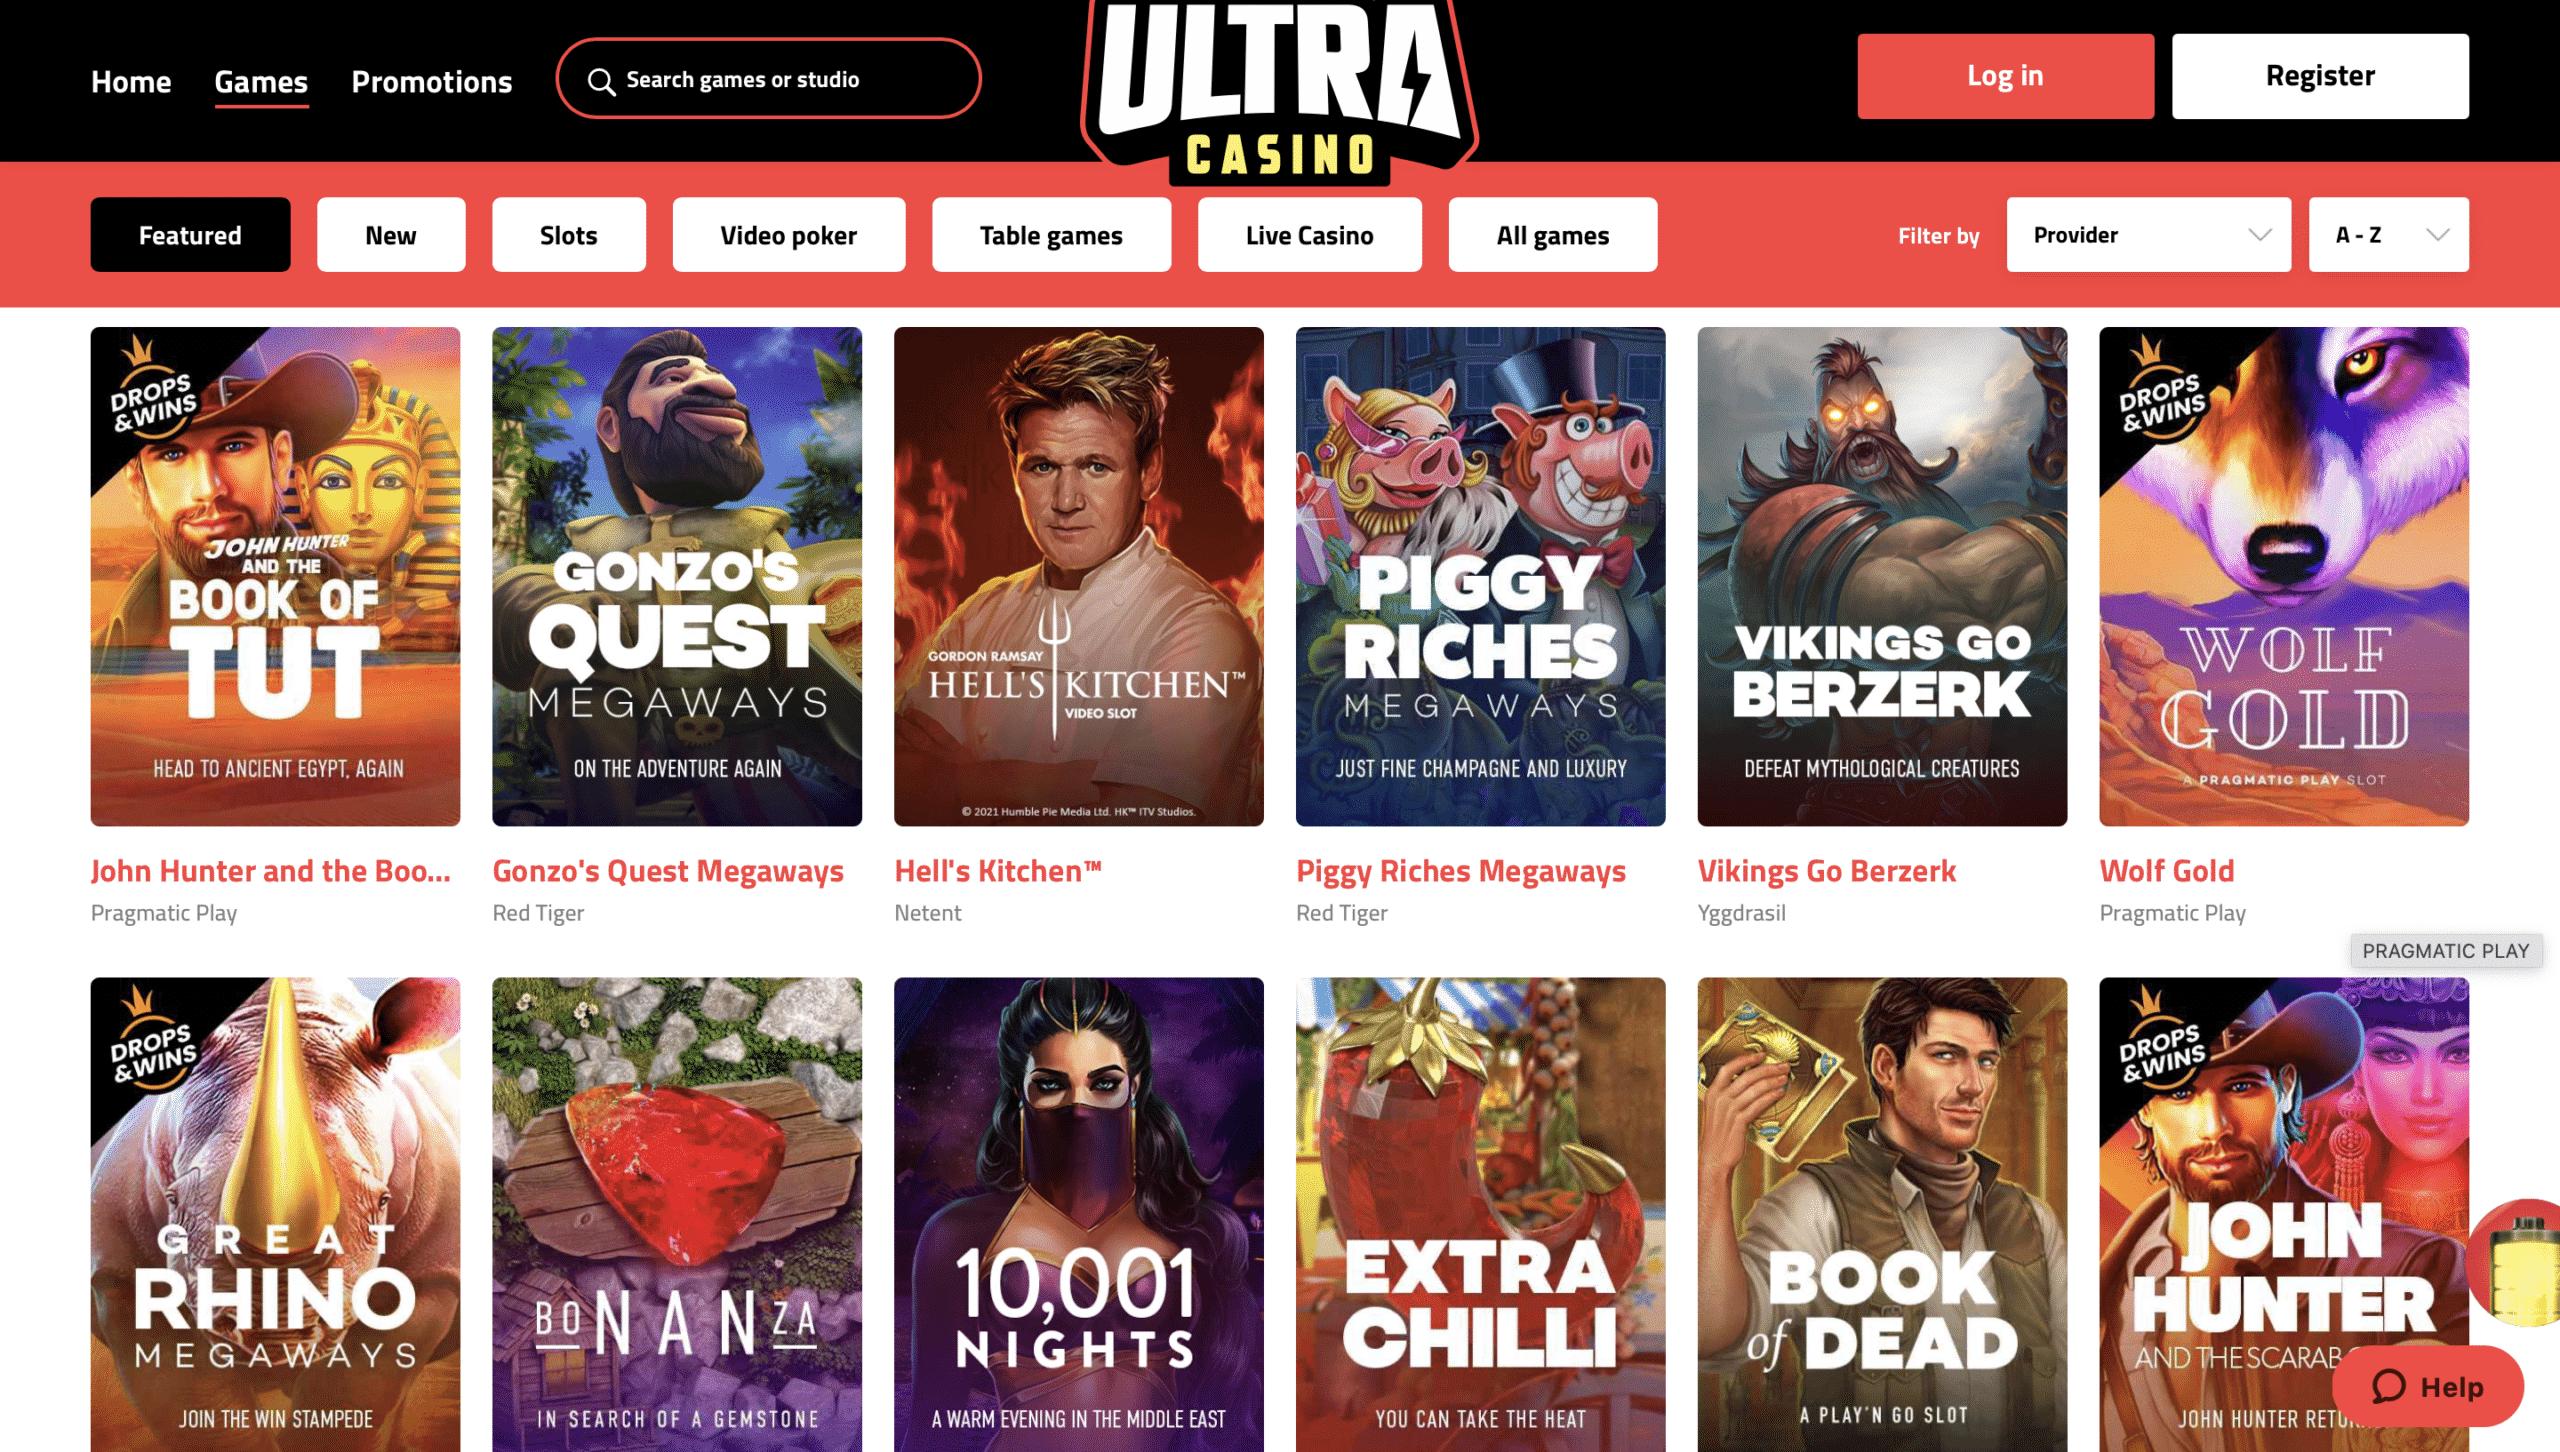 UltraCasino Game Selection